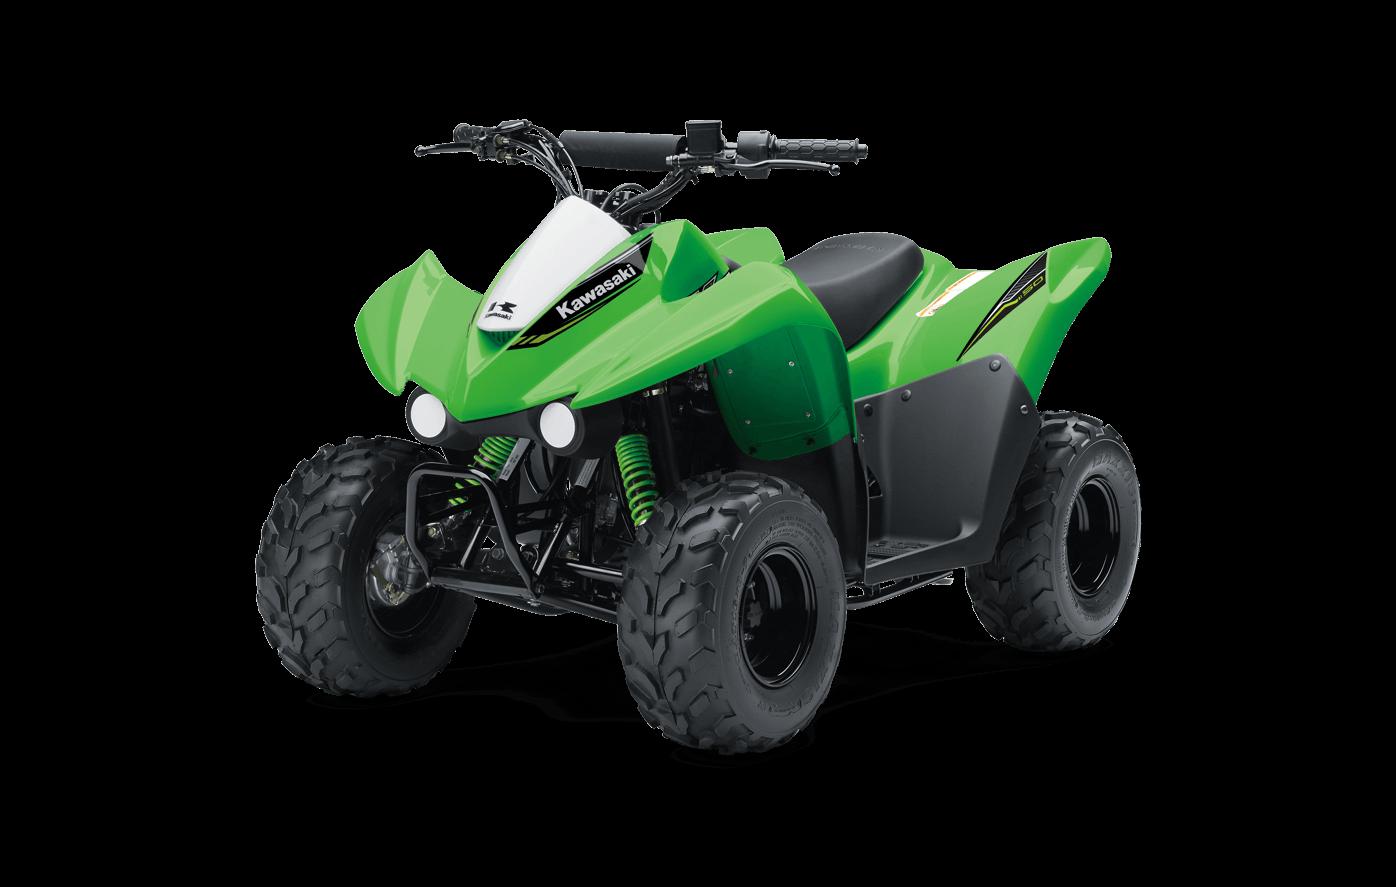 Kawasaki Motocicleta